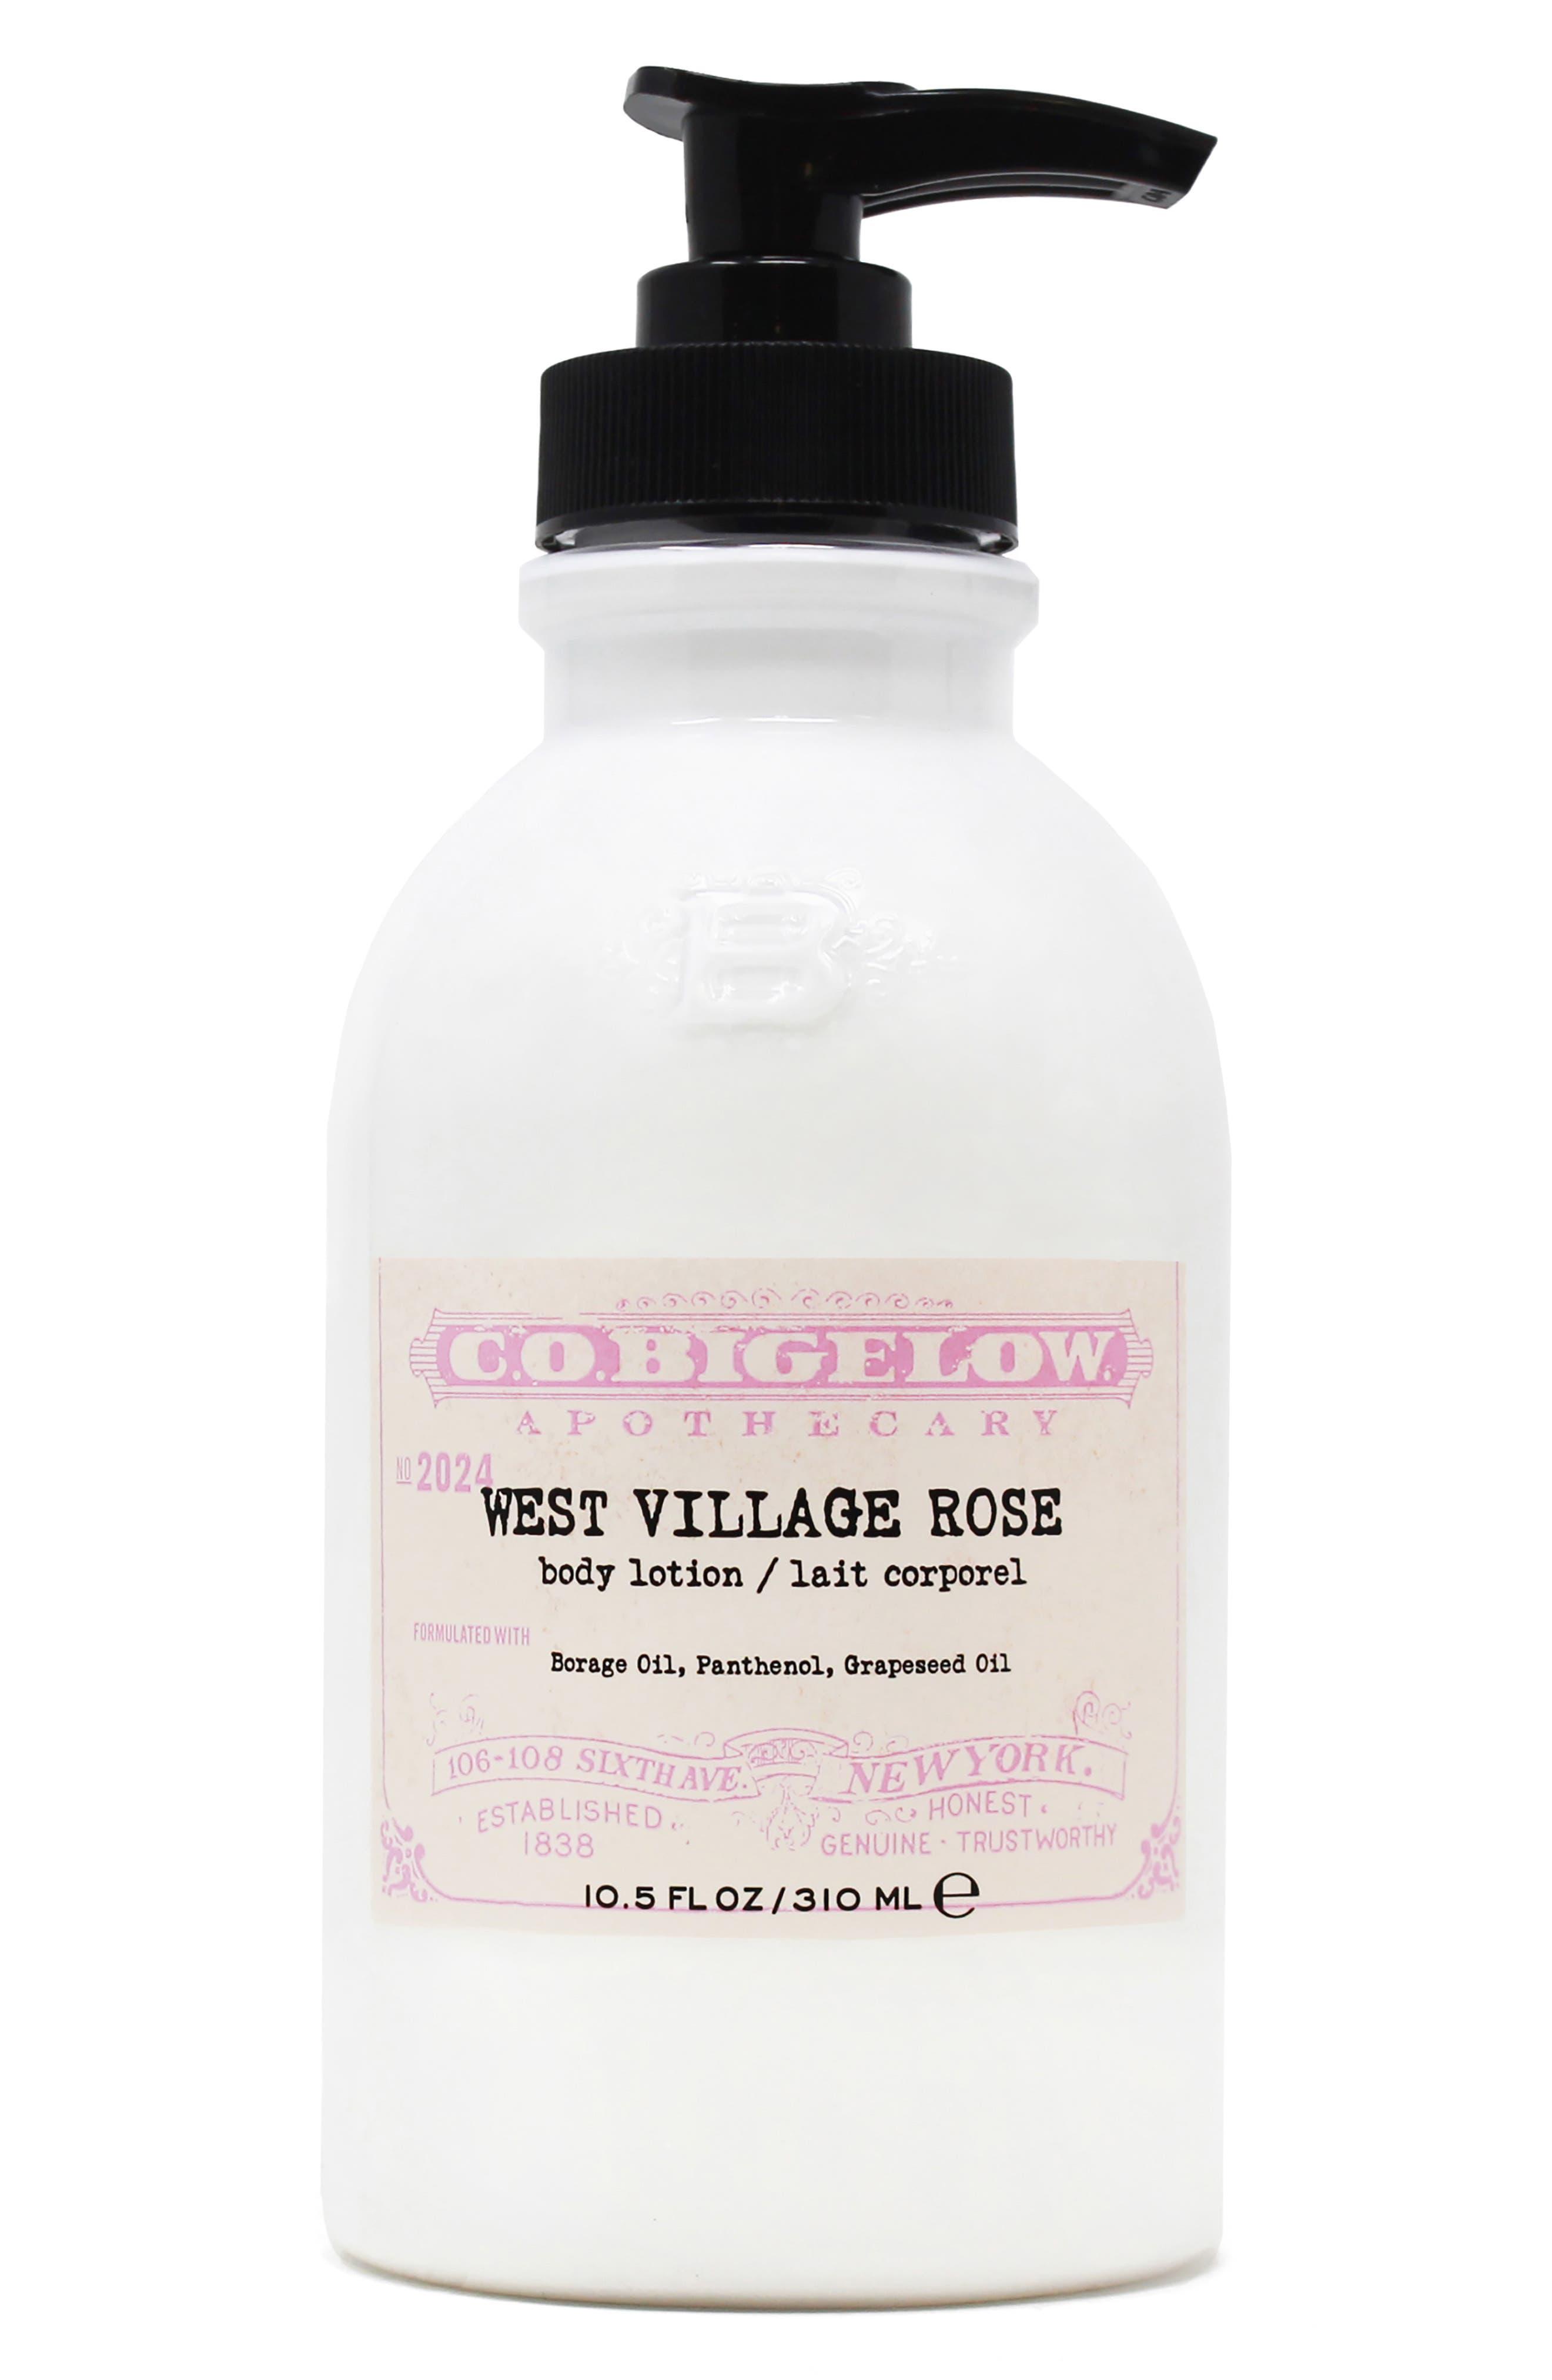 C.o. Bigelow West Village Rose Body Lotion